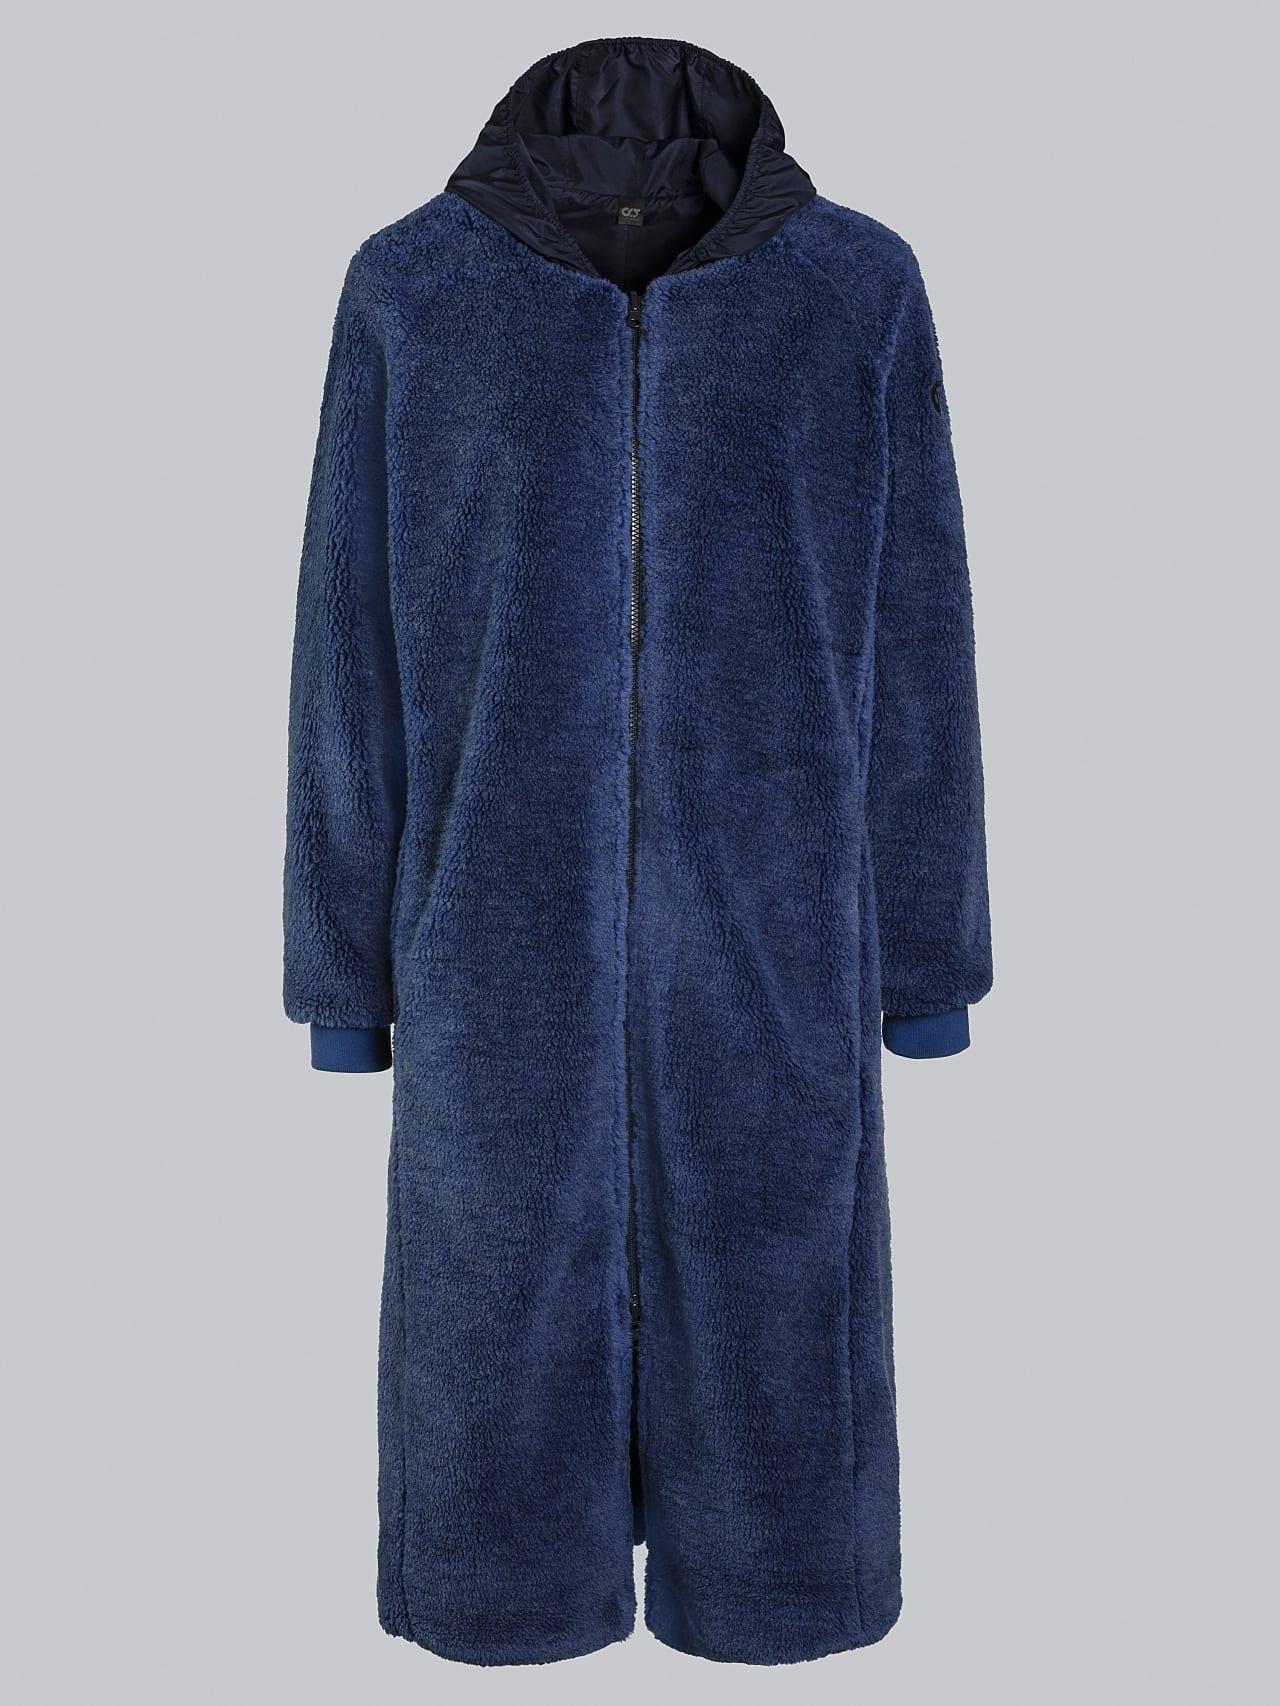 OMANE V1.Y5.02 Reversible Pile Wool Maxi Coat light blue Back Alpha Tauri